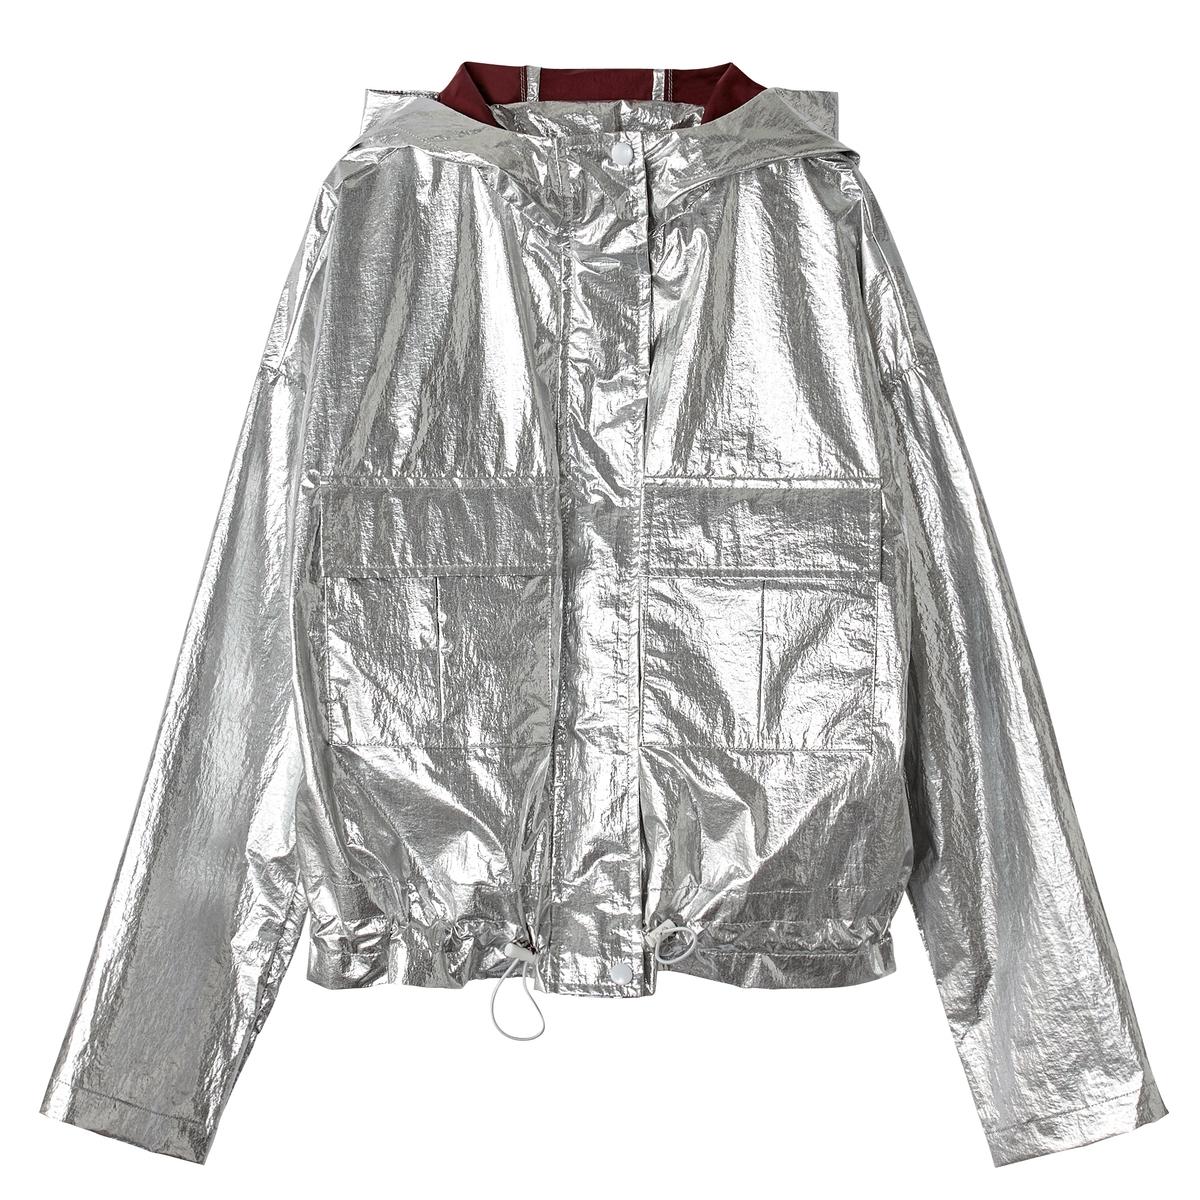 Giacca a vento con cappuccio, color argento